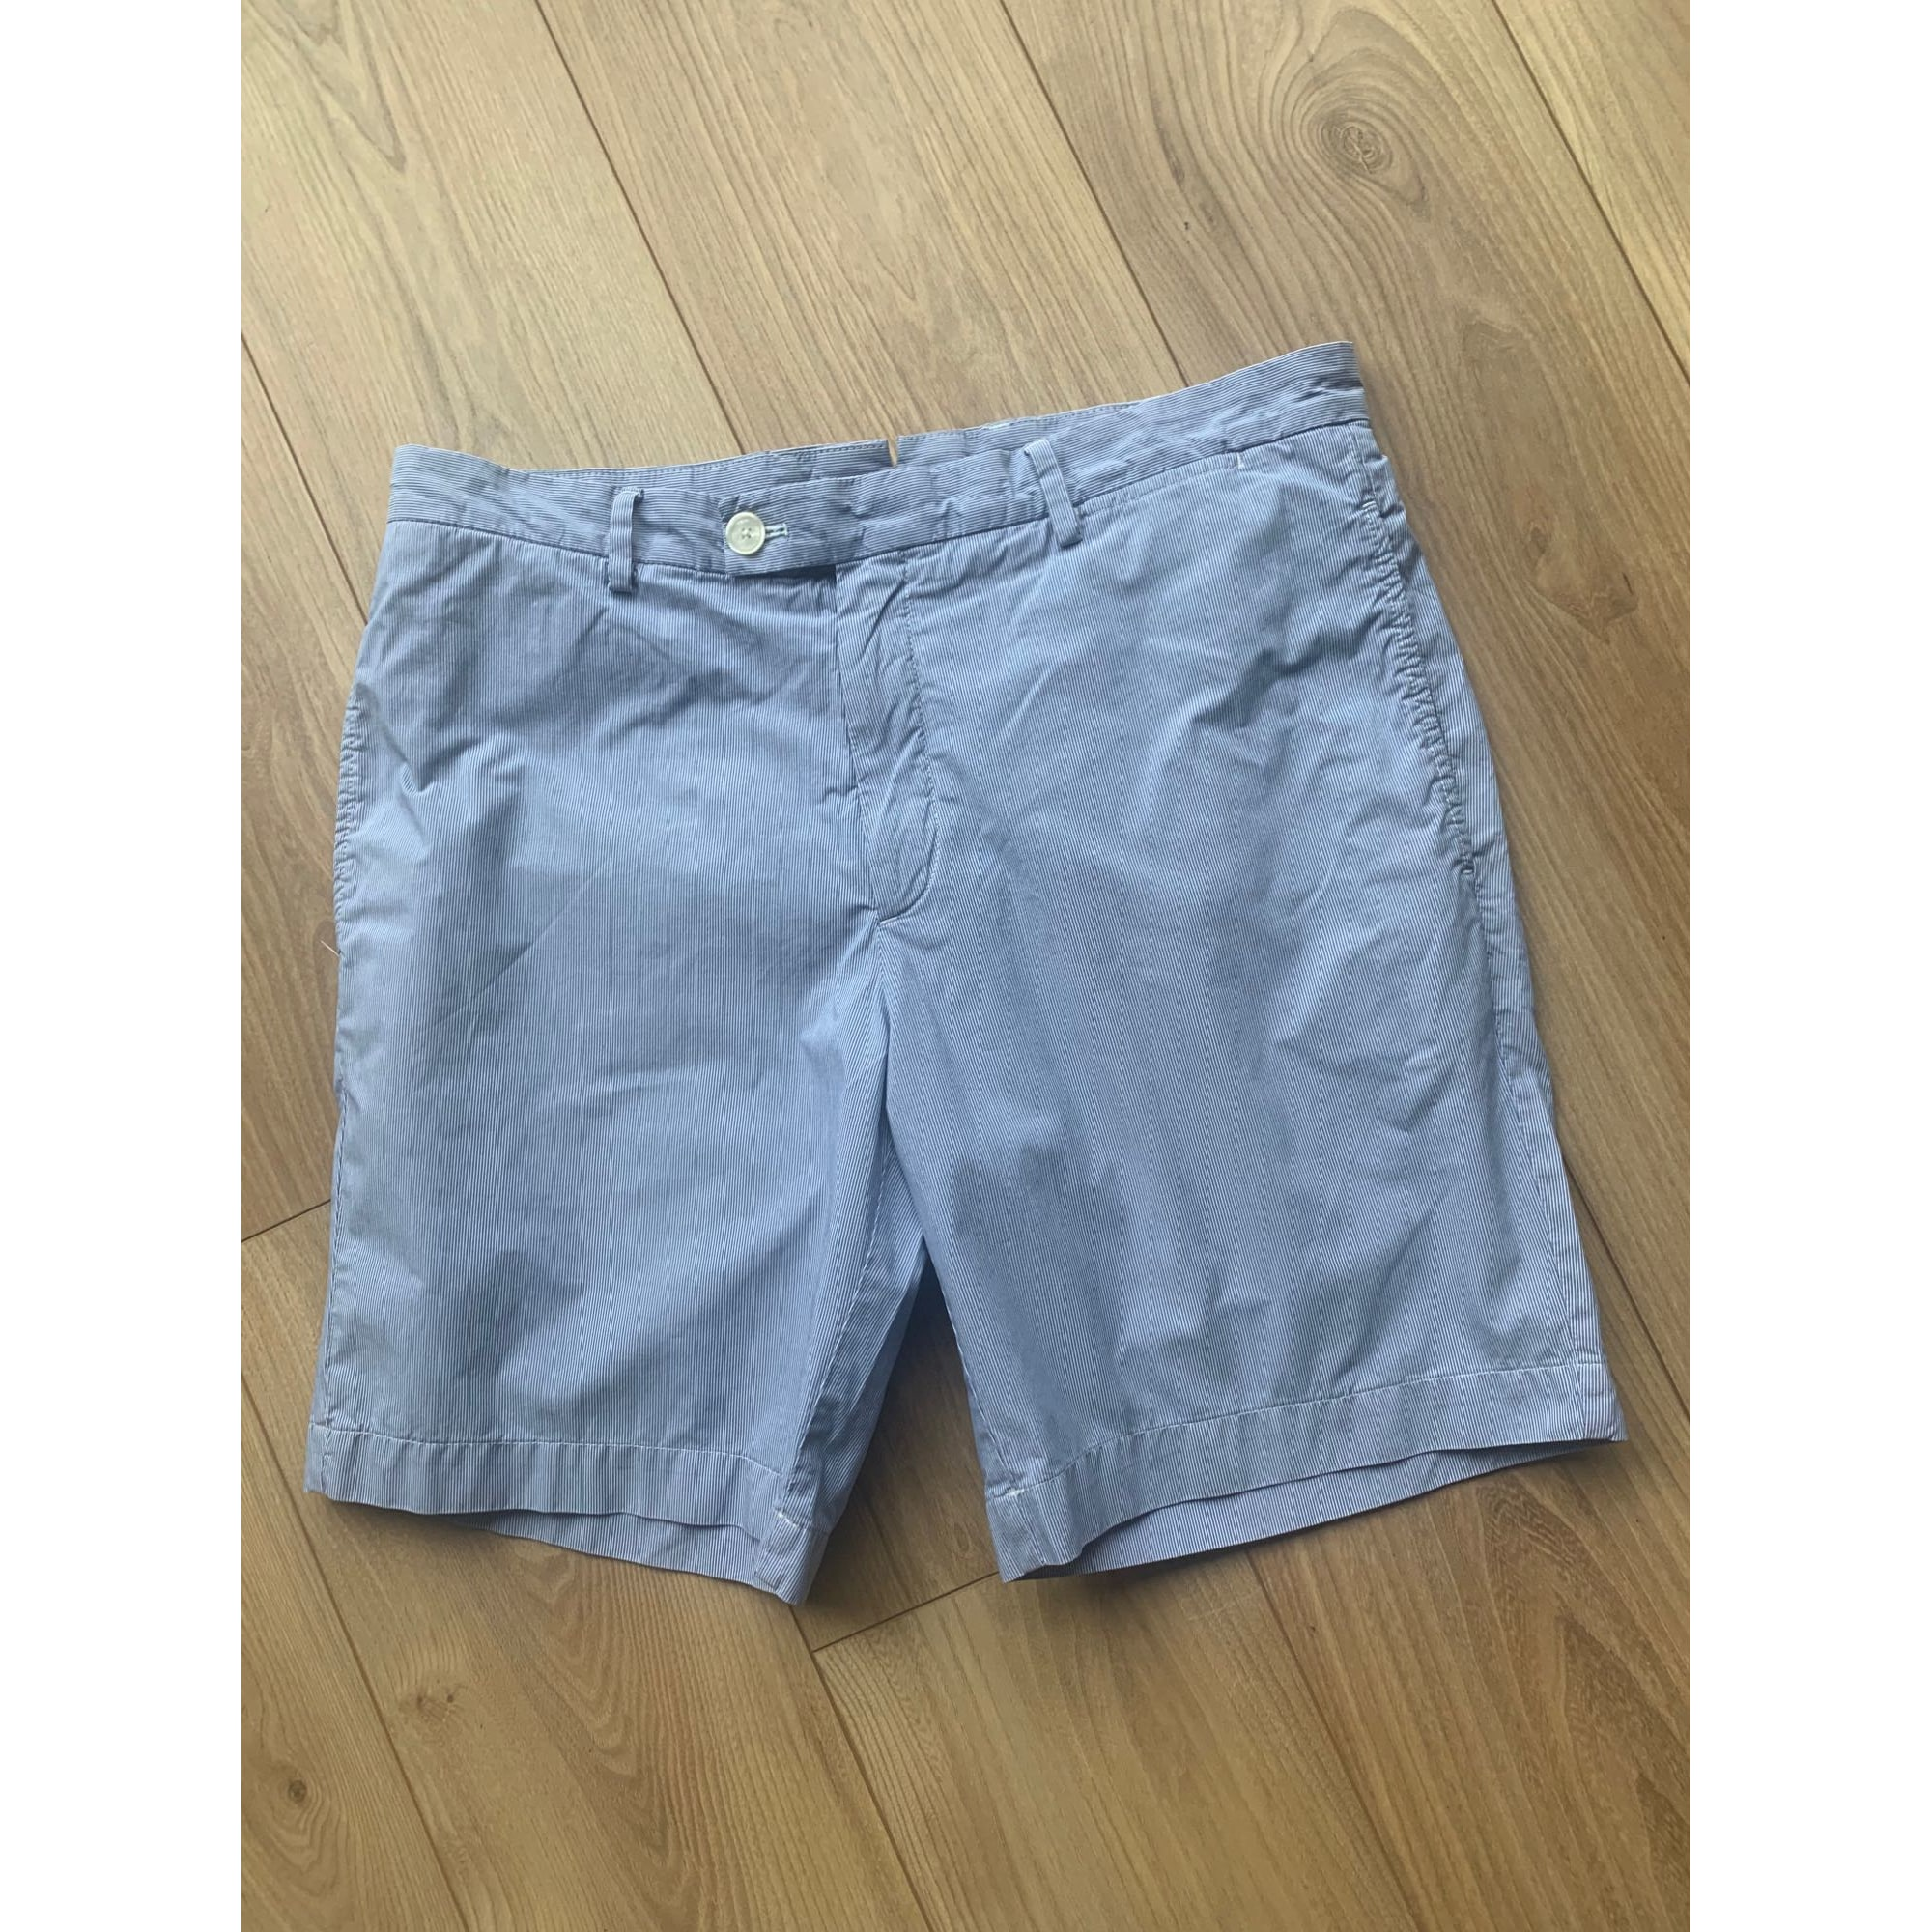 Short EDEN PARK Bleu, bleu marine, bleu turquoise